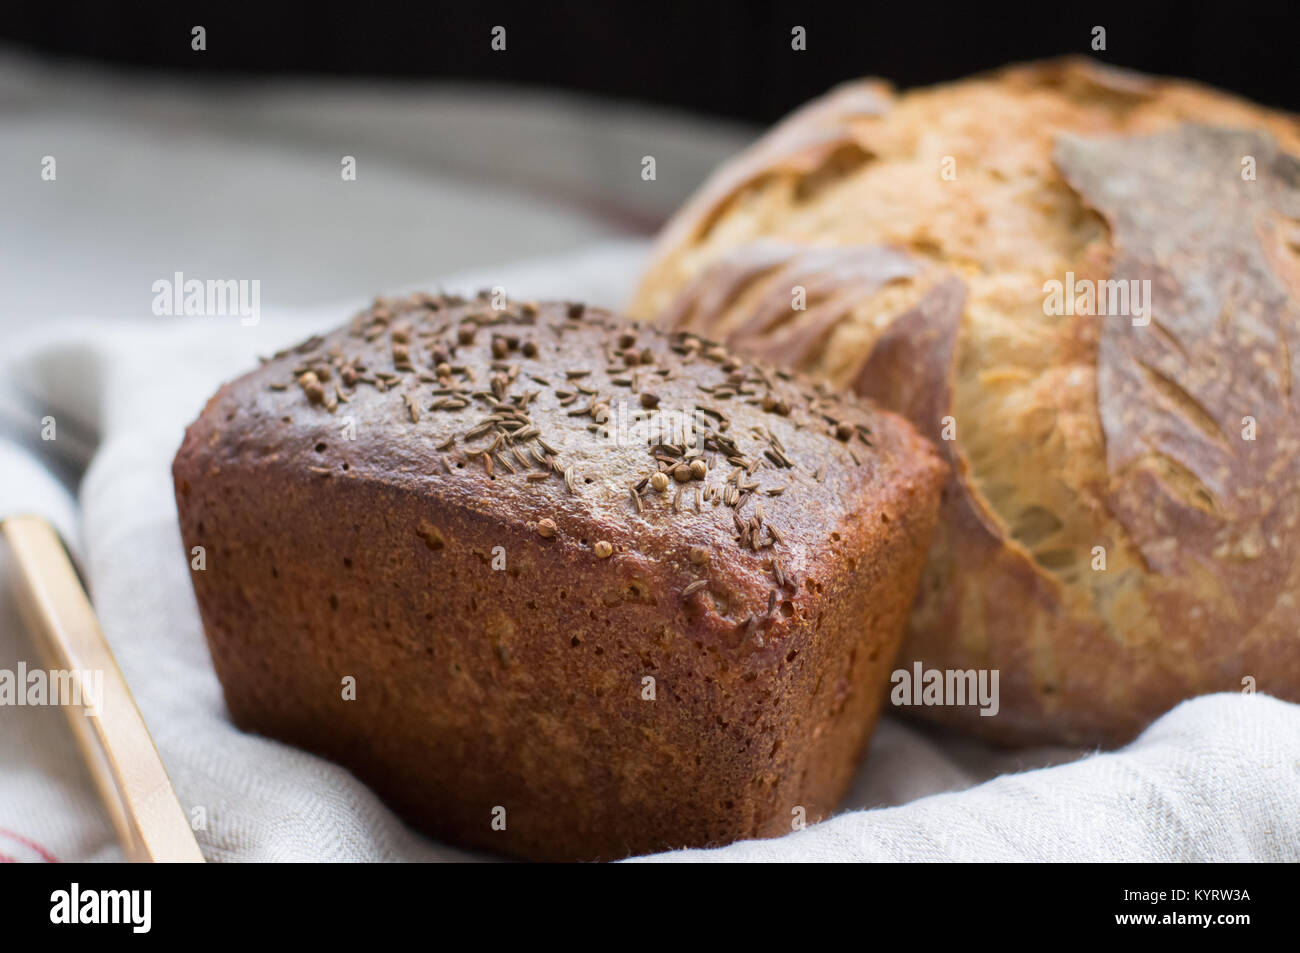 Homemade wholemeal bread handicraft - Stock Image